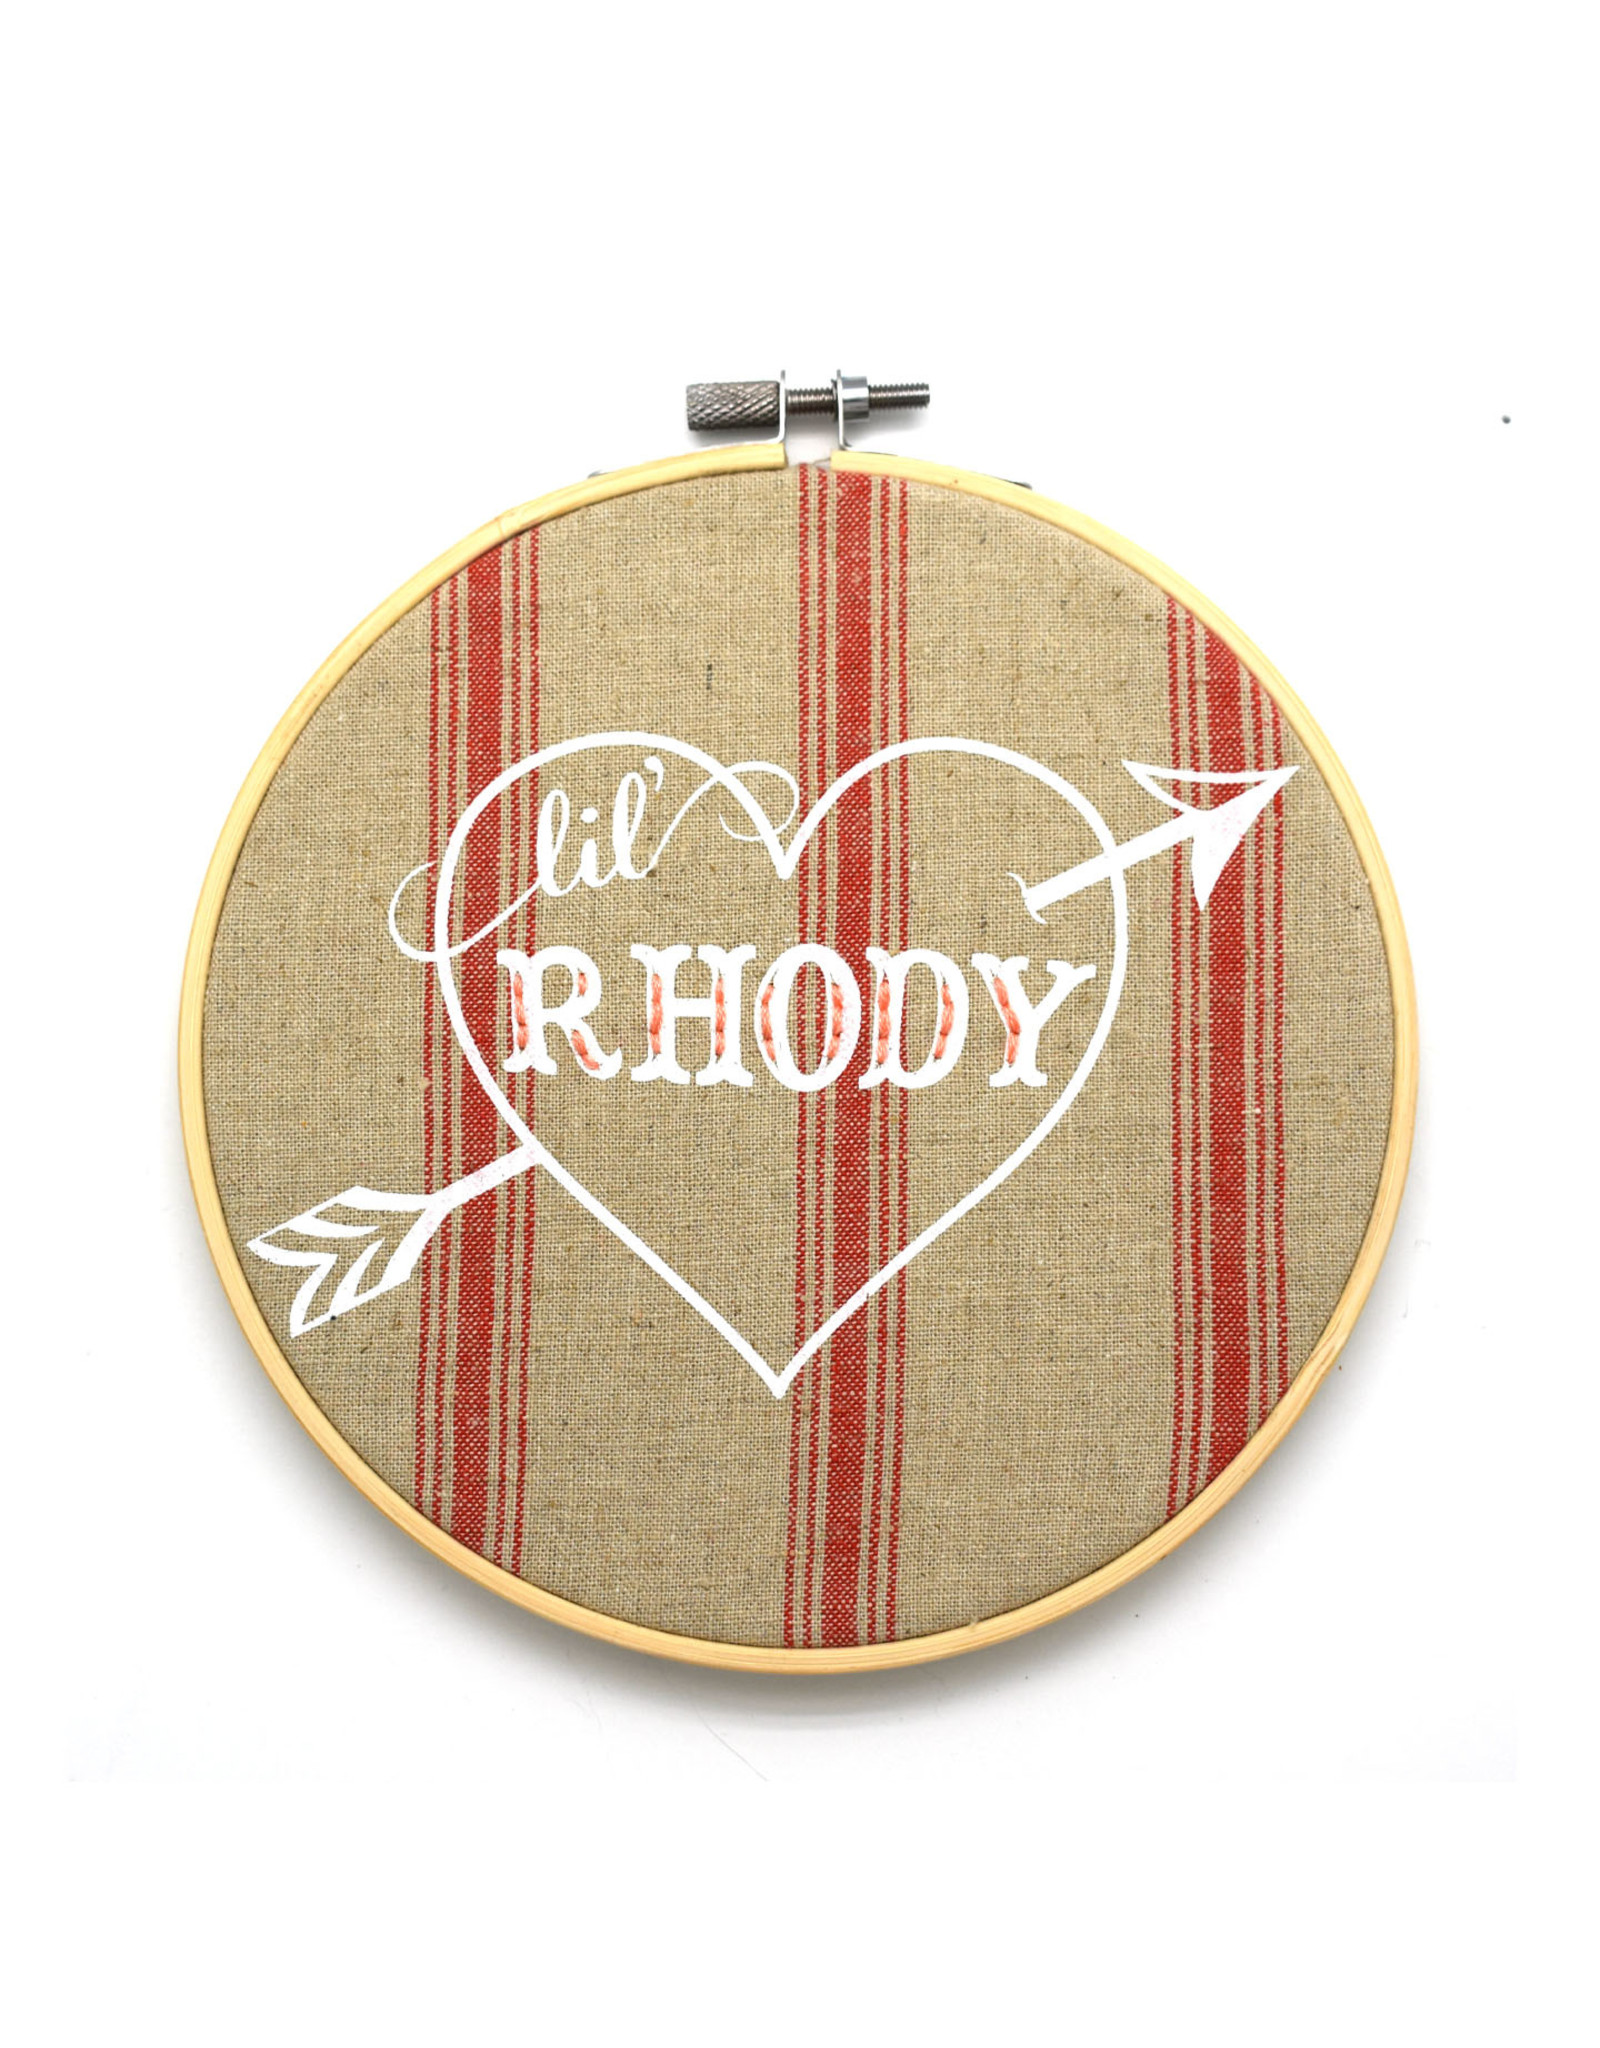 Lil' Rhody Heart Sampler Hoop